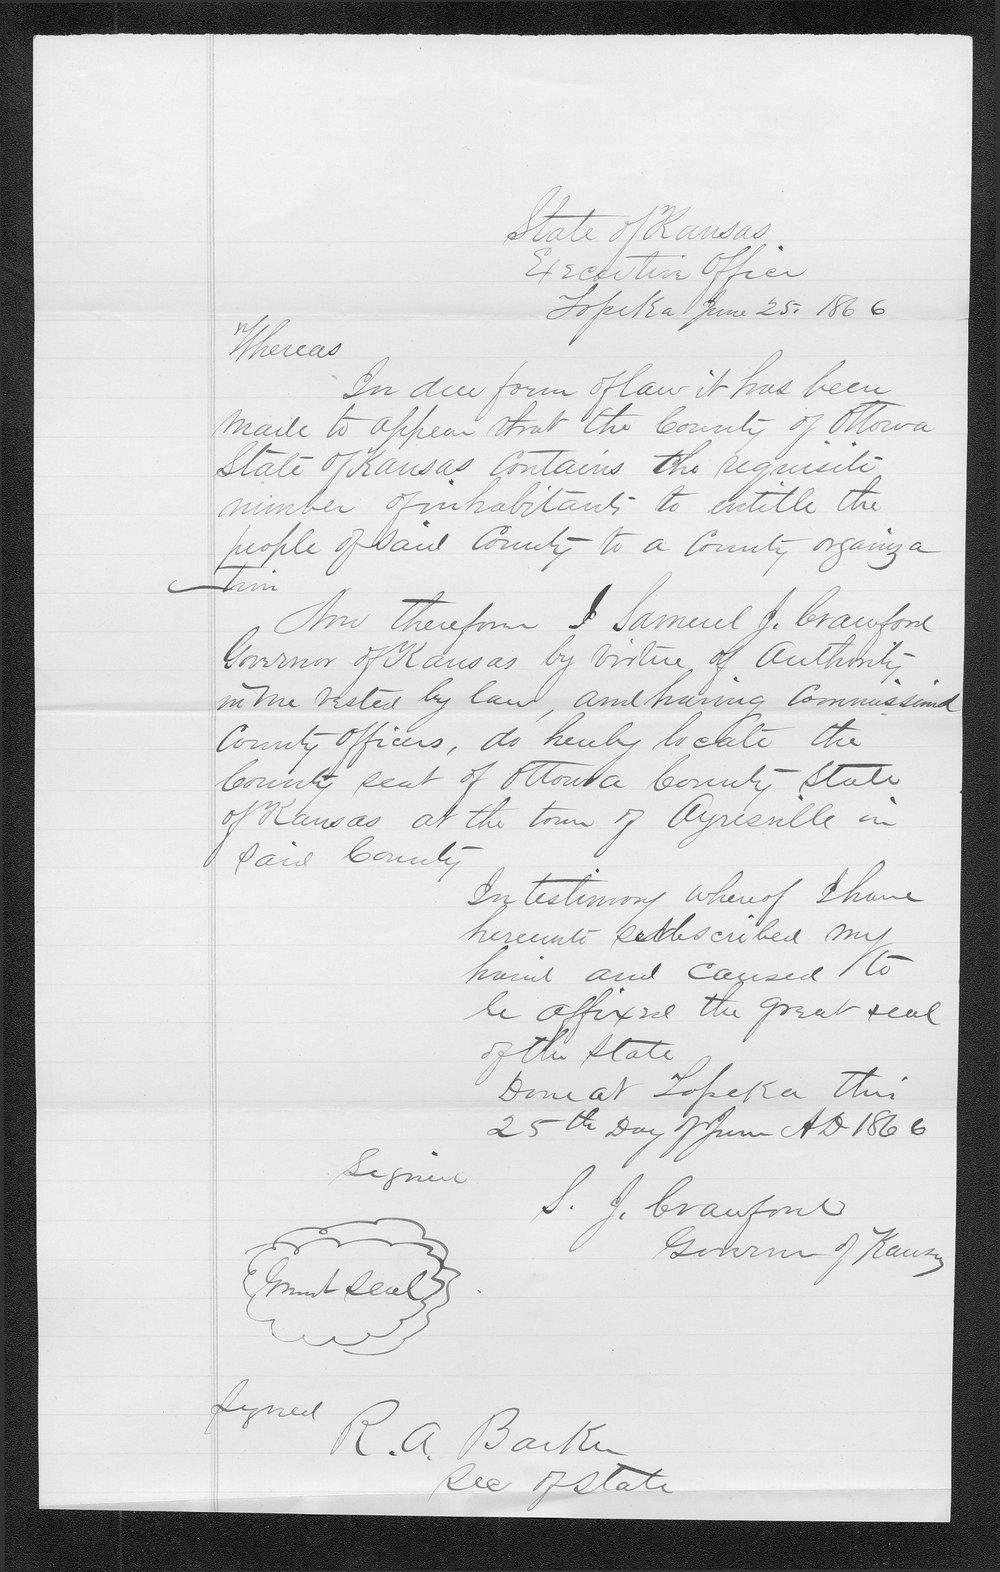 Ottawa County organization records - 8